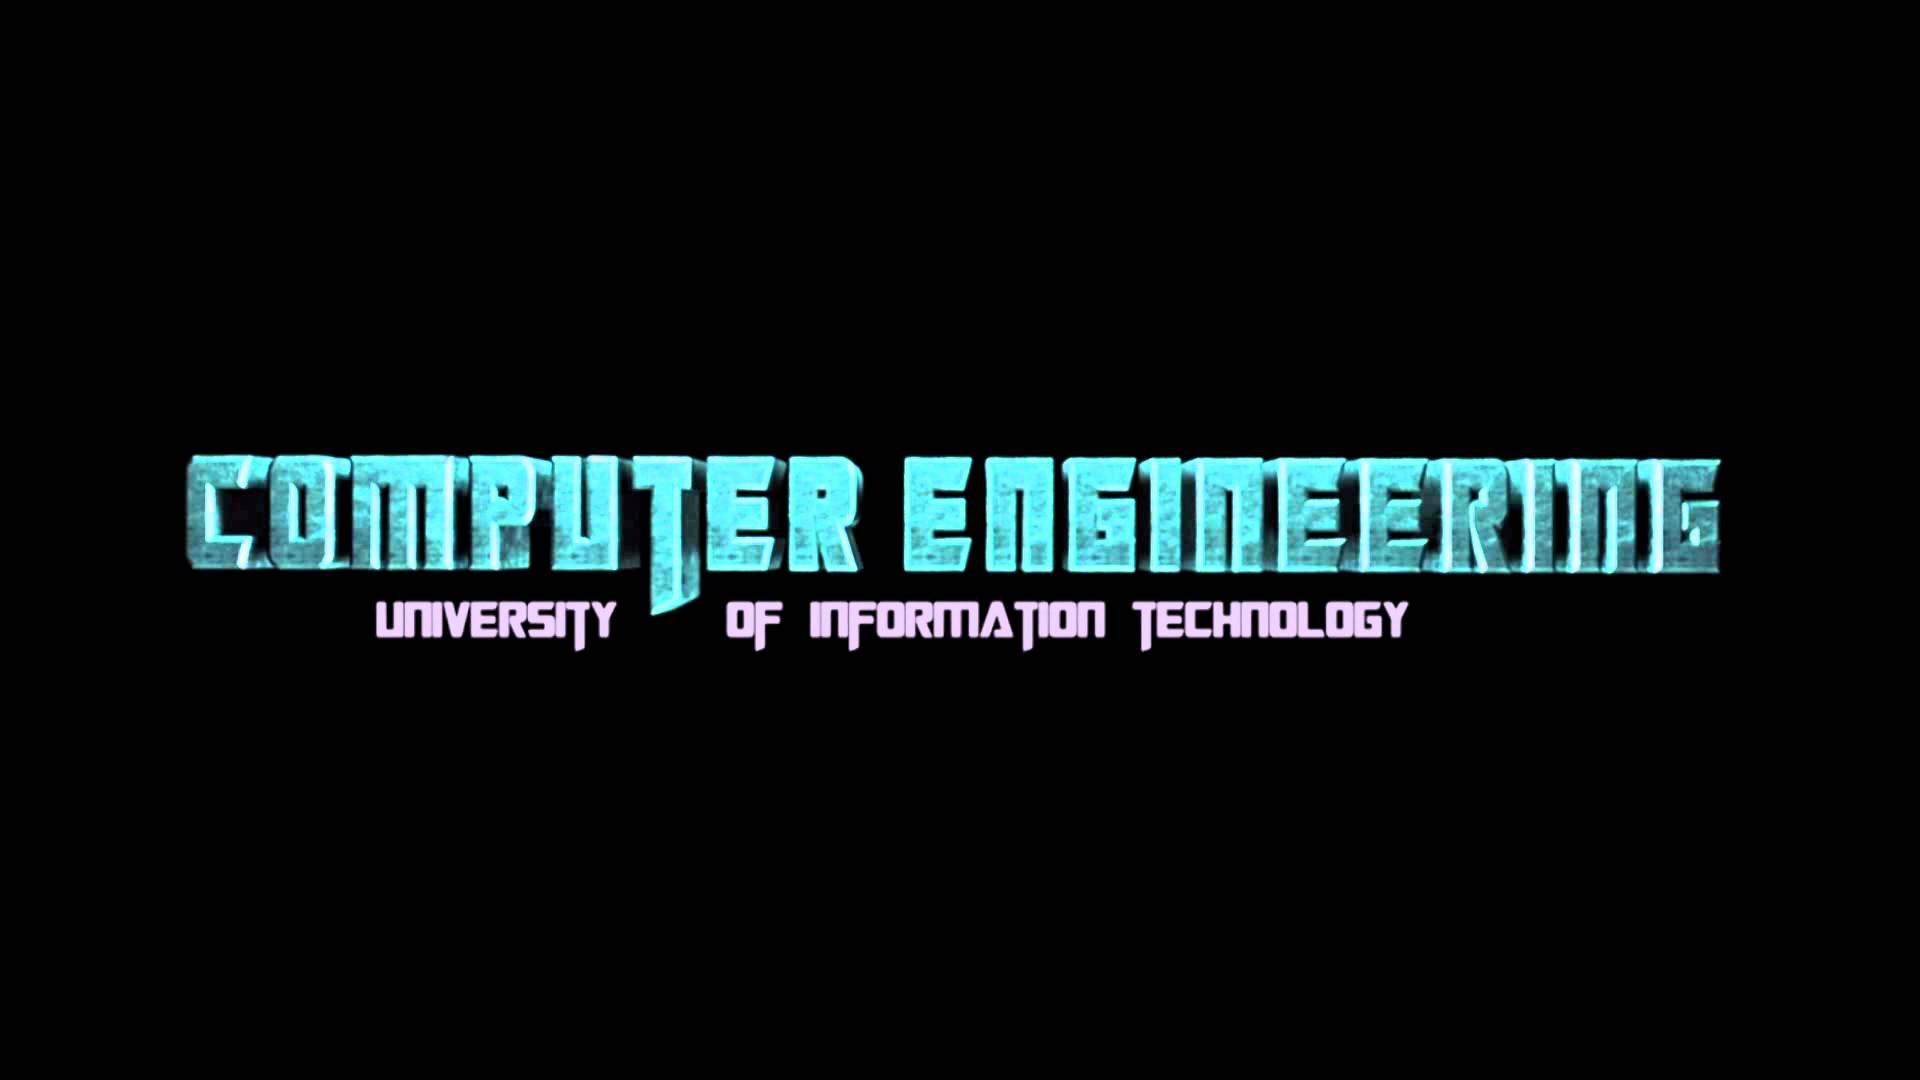 Computer Engineer Wallpapers - Wallpaper Cave